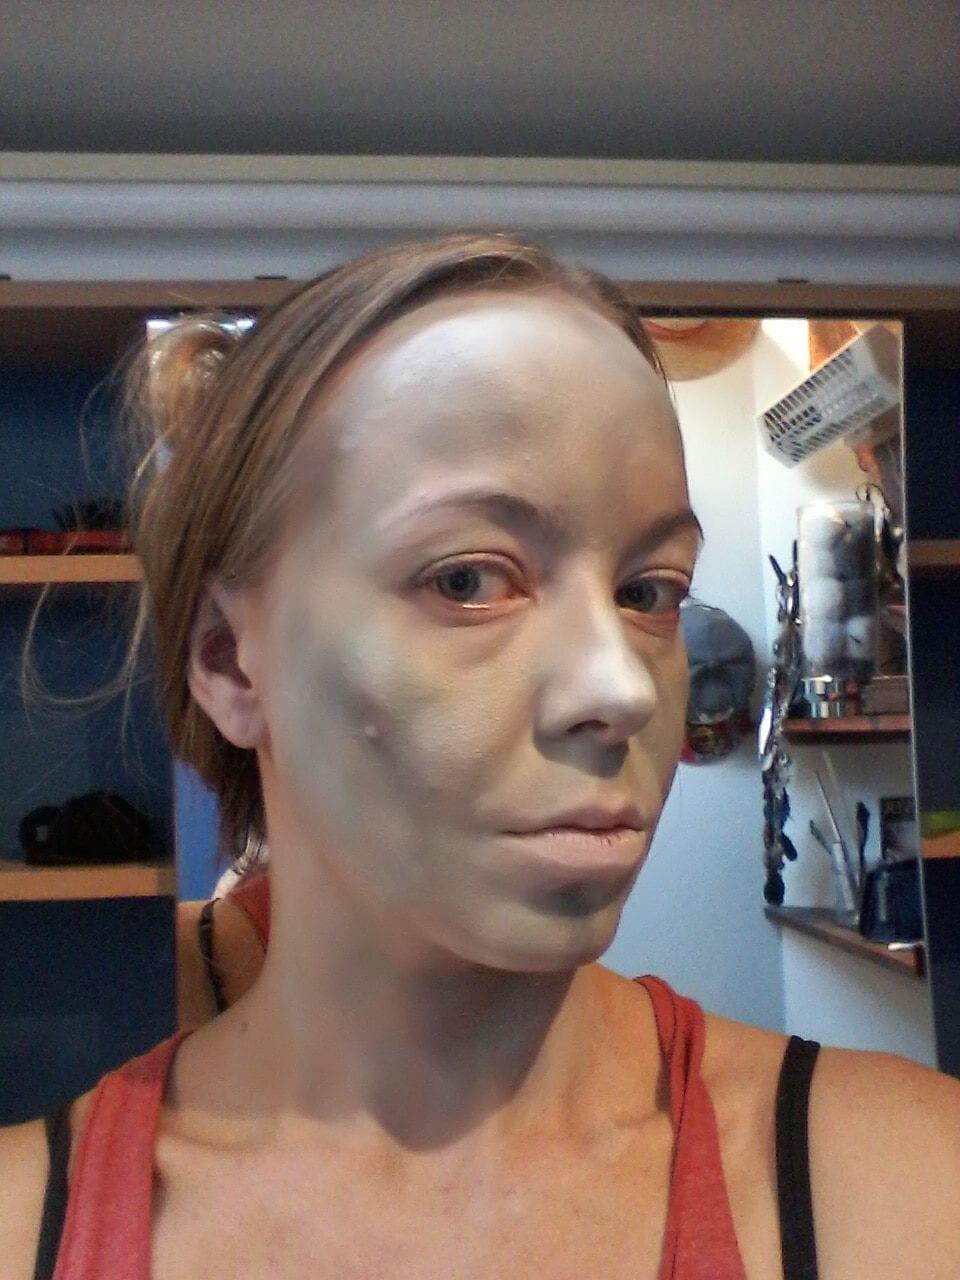 Maquillage halloween - l'exorciste - visage peint en blanc + vert